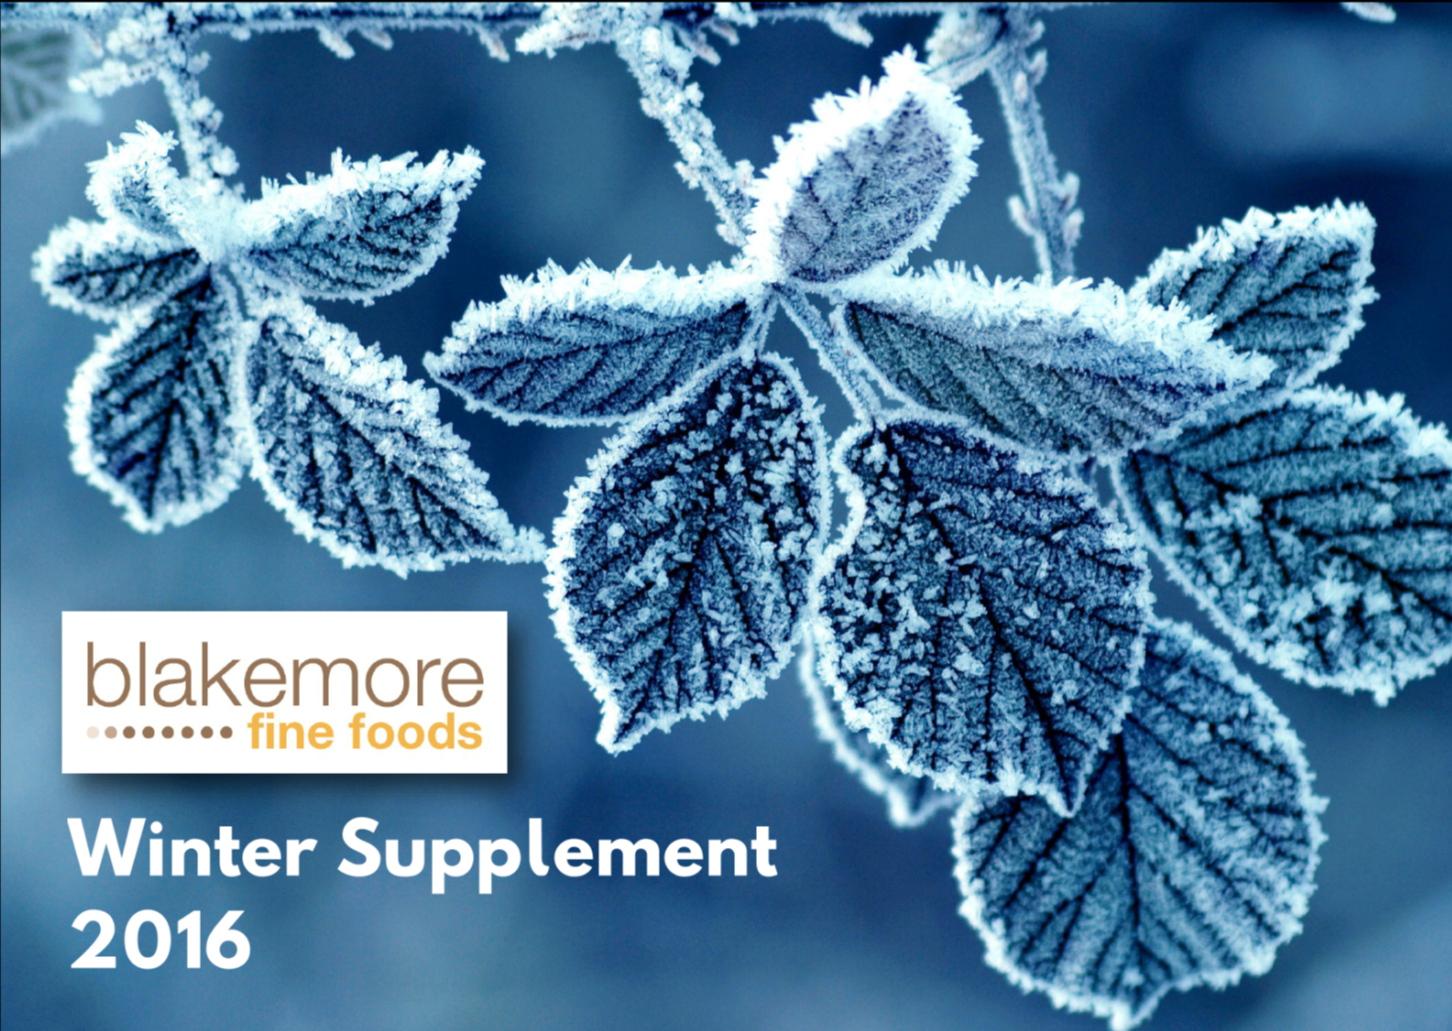 Blakemore_Fine_Foods_Winter_Supplement